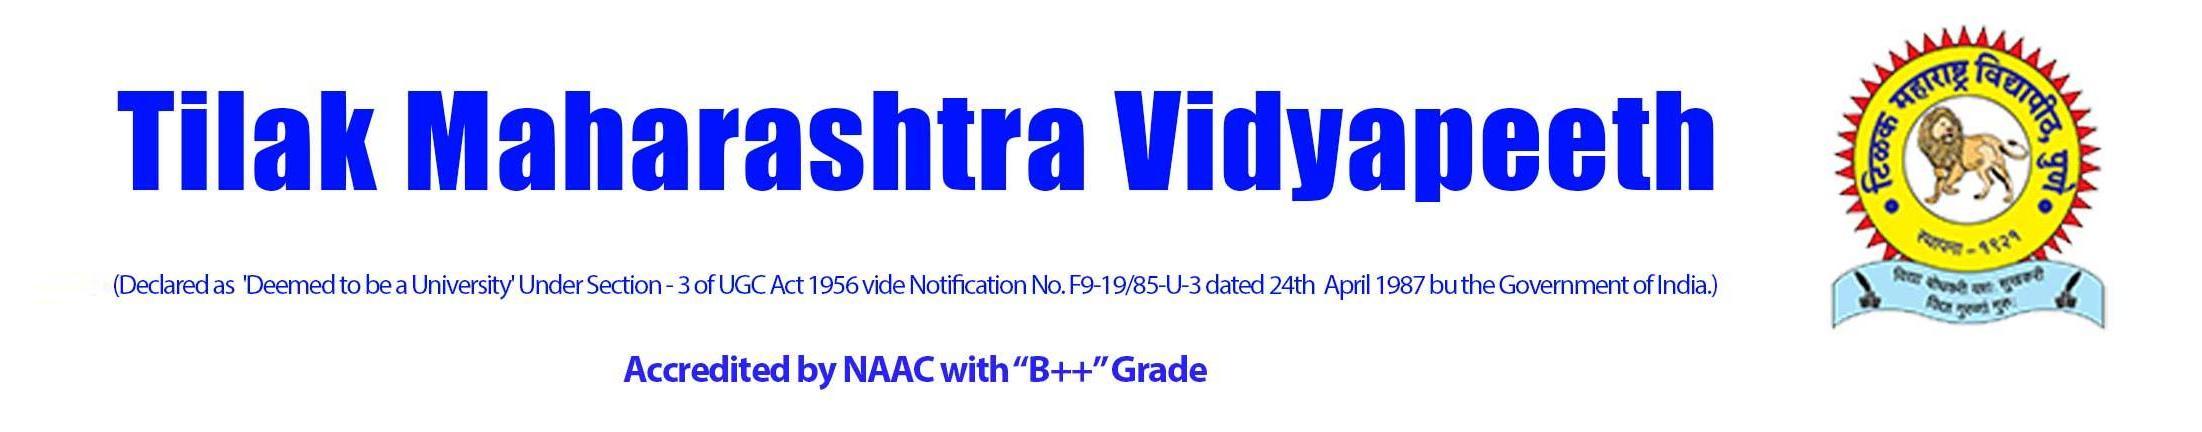 Tilak Maharashtra University Ist/2nd/3rd BA BSC BCOM Result 2021 - TVM Tilak Maharashtra Vidyapeeth UG/PG Results 2021 1